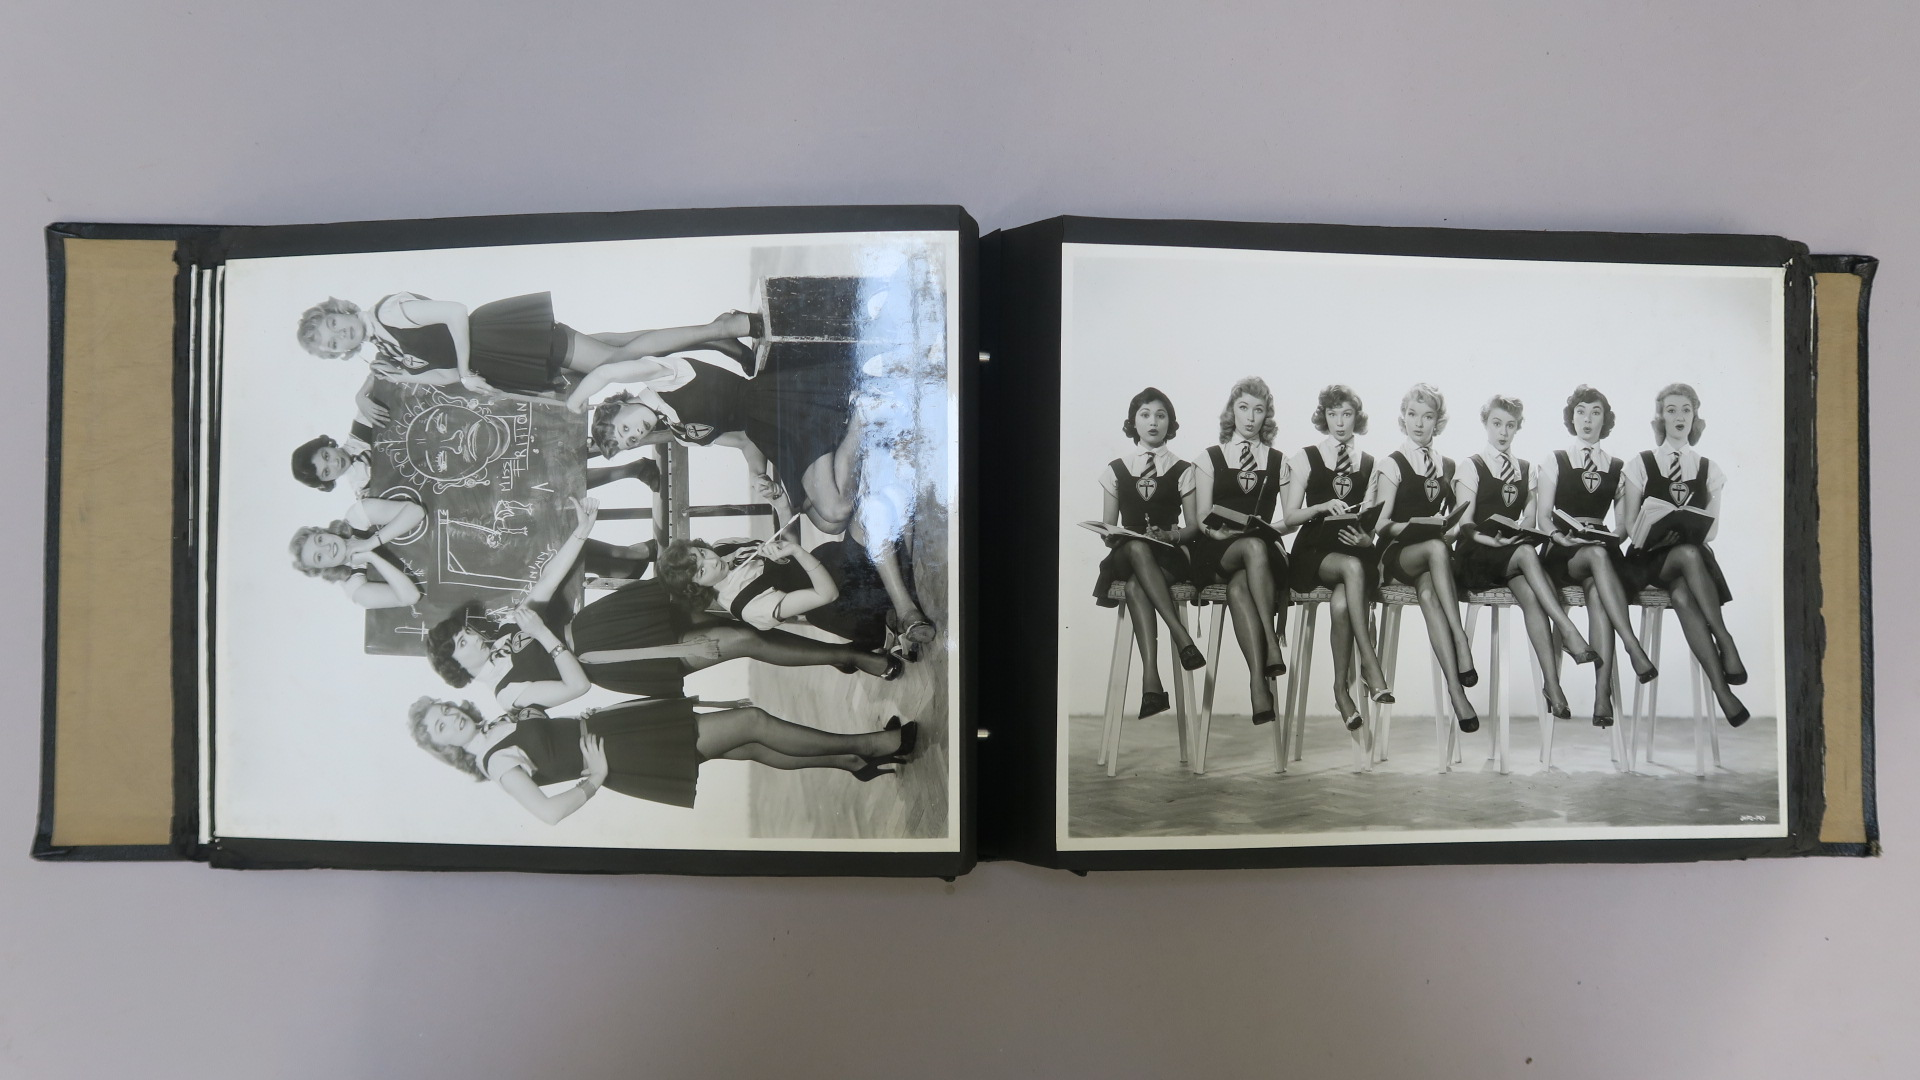 Lot 45 - Blue Murder at St. Trinian's (1957) original key book of black & white publicity stills by